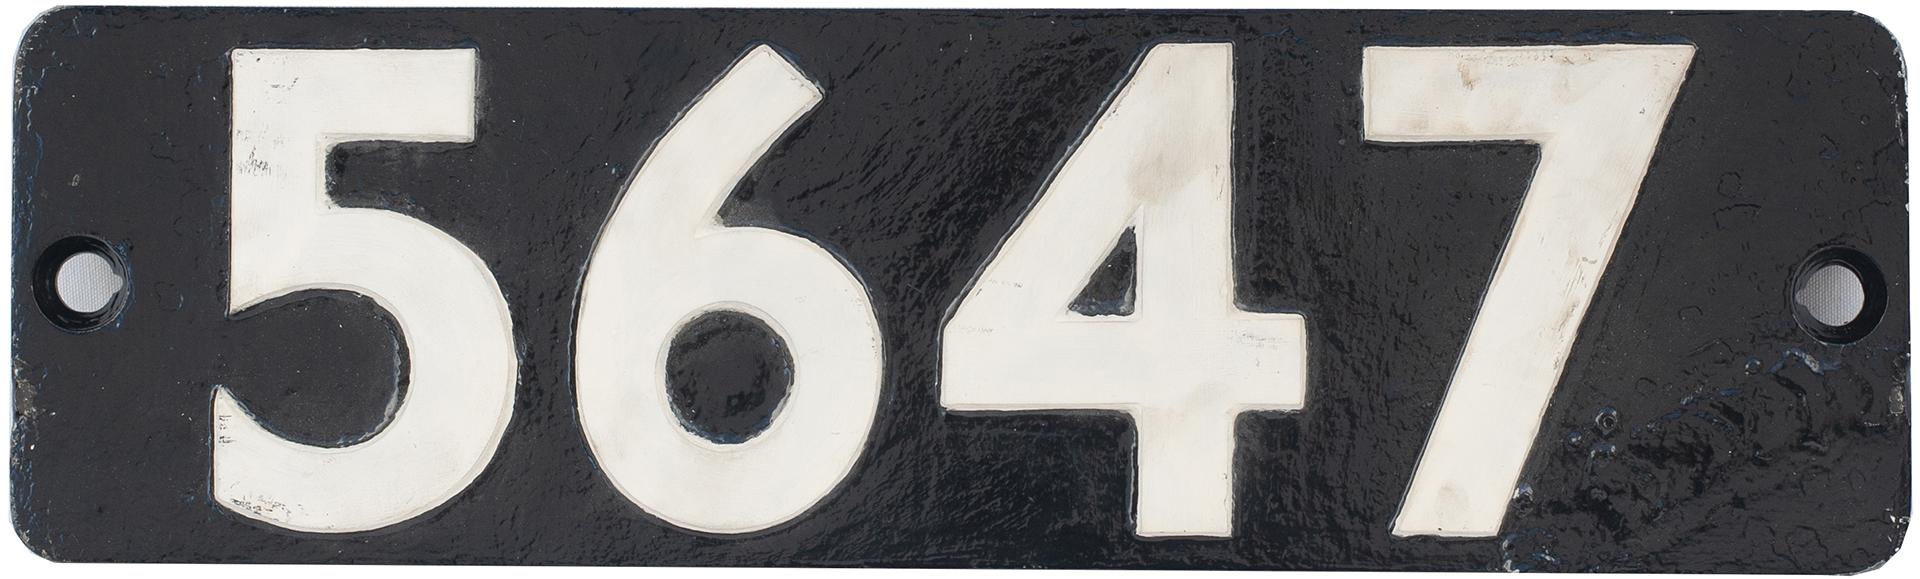 Smokebox Numberplate 5647 Ex GWR Collett 0-6-2 T